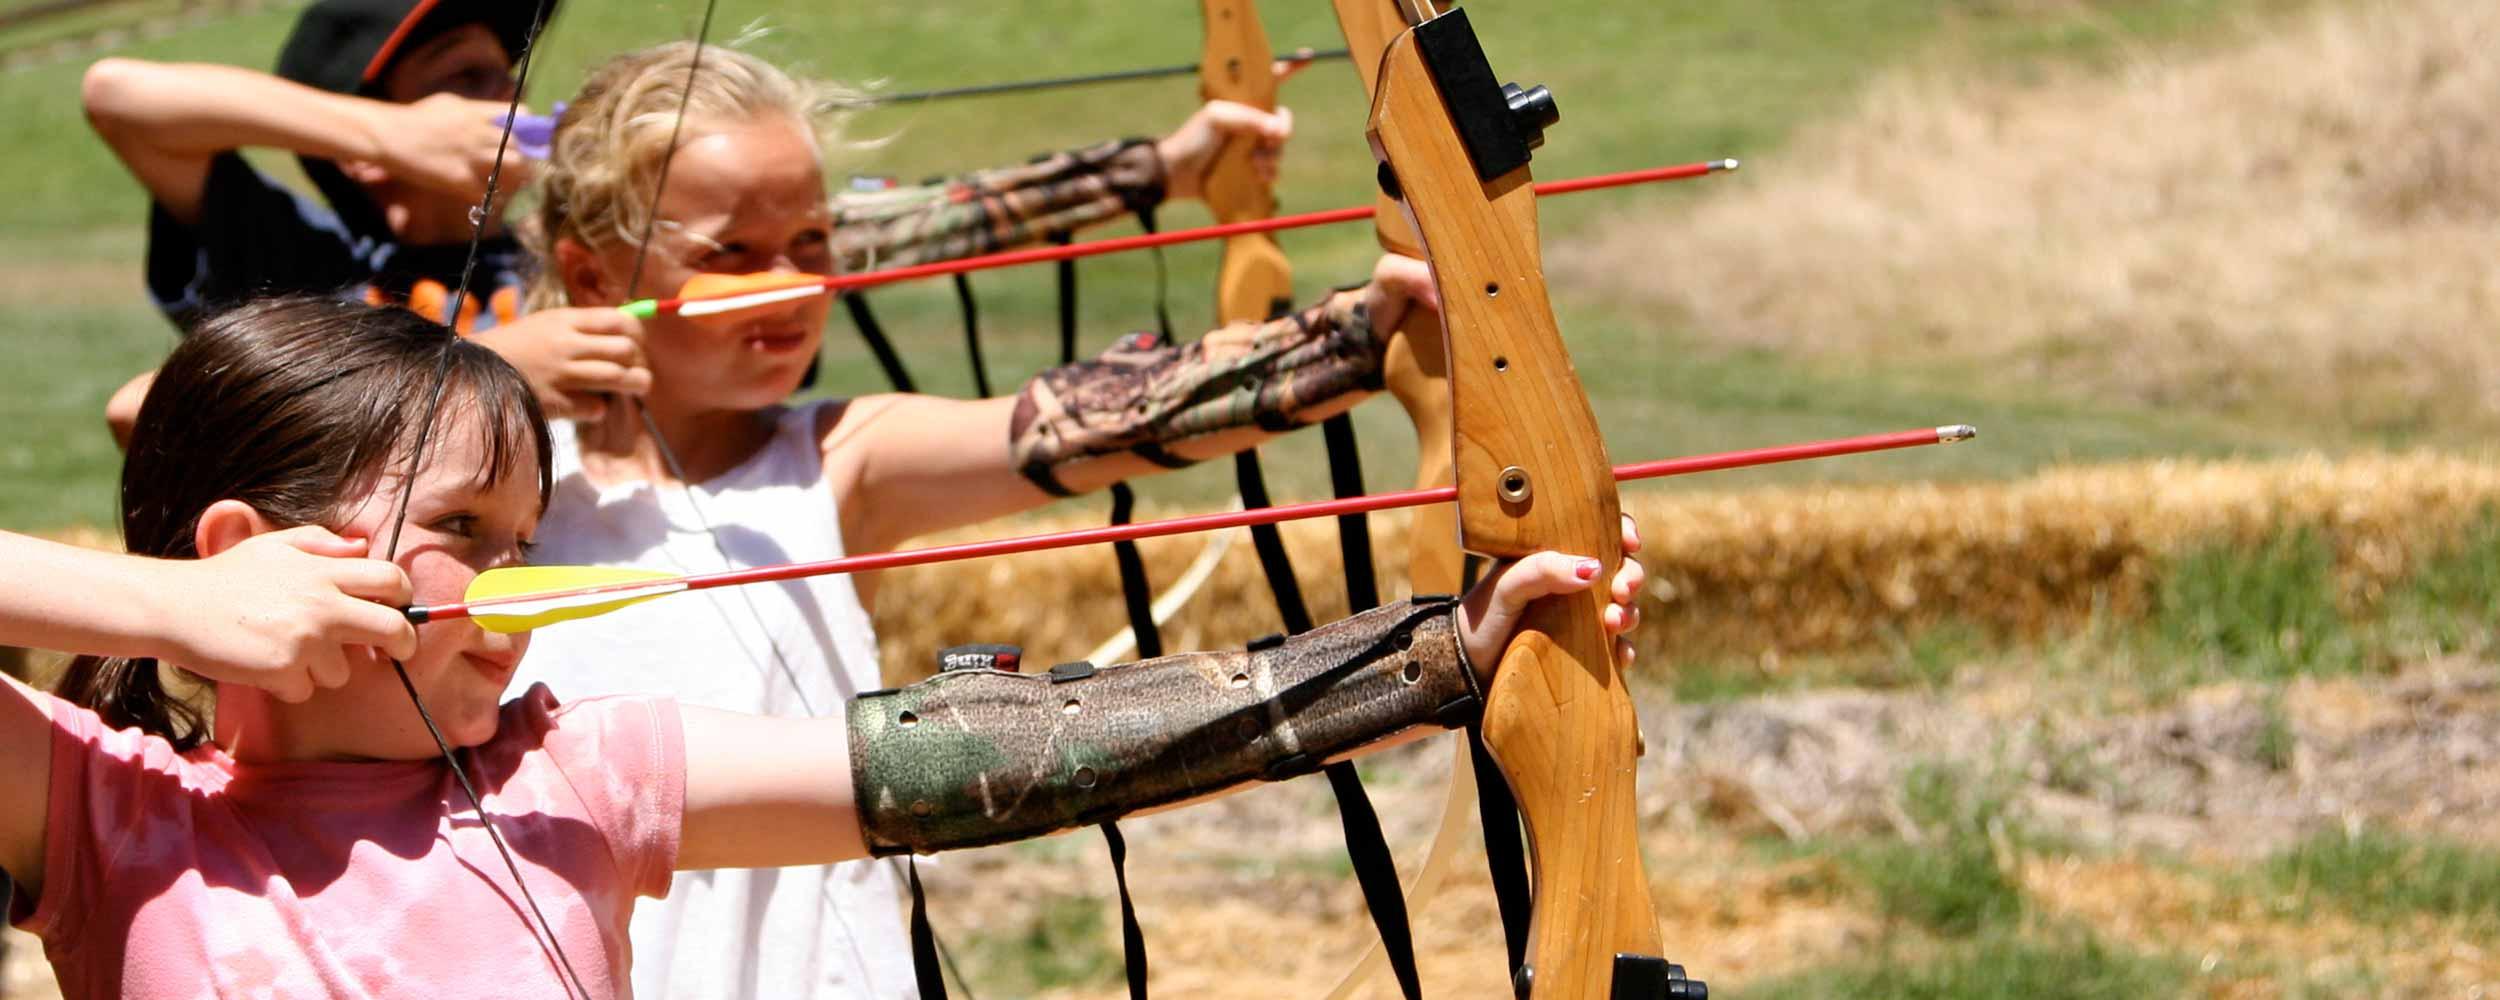 kids archery - Alisal Resort in Solvang California